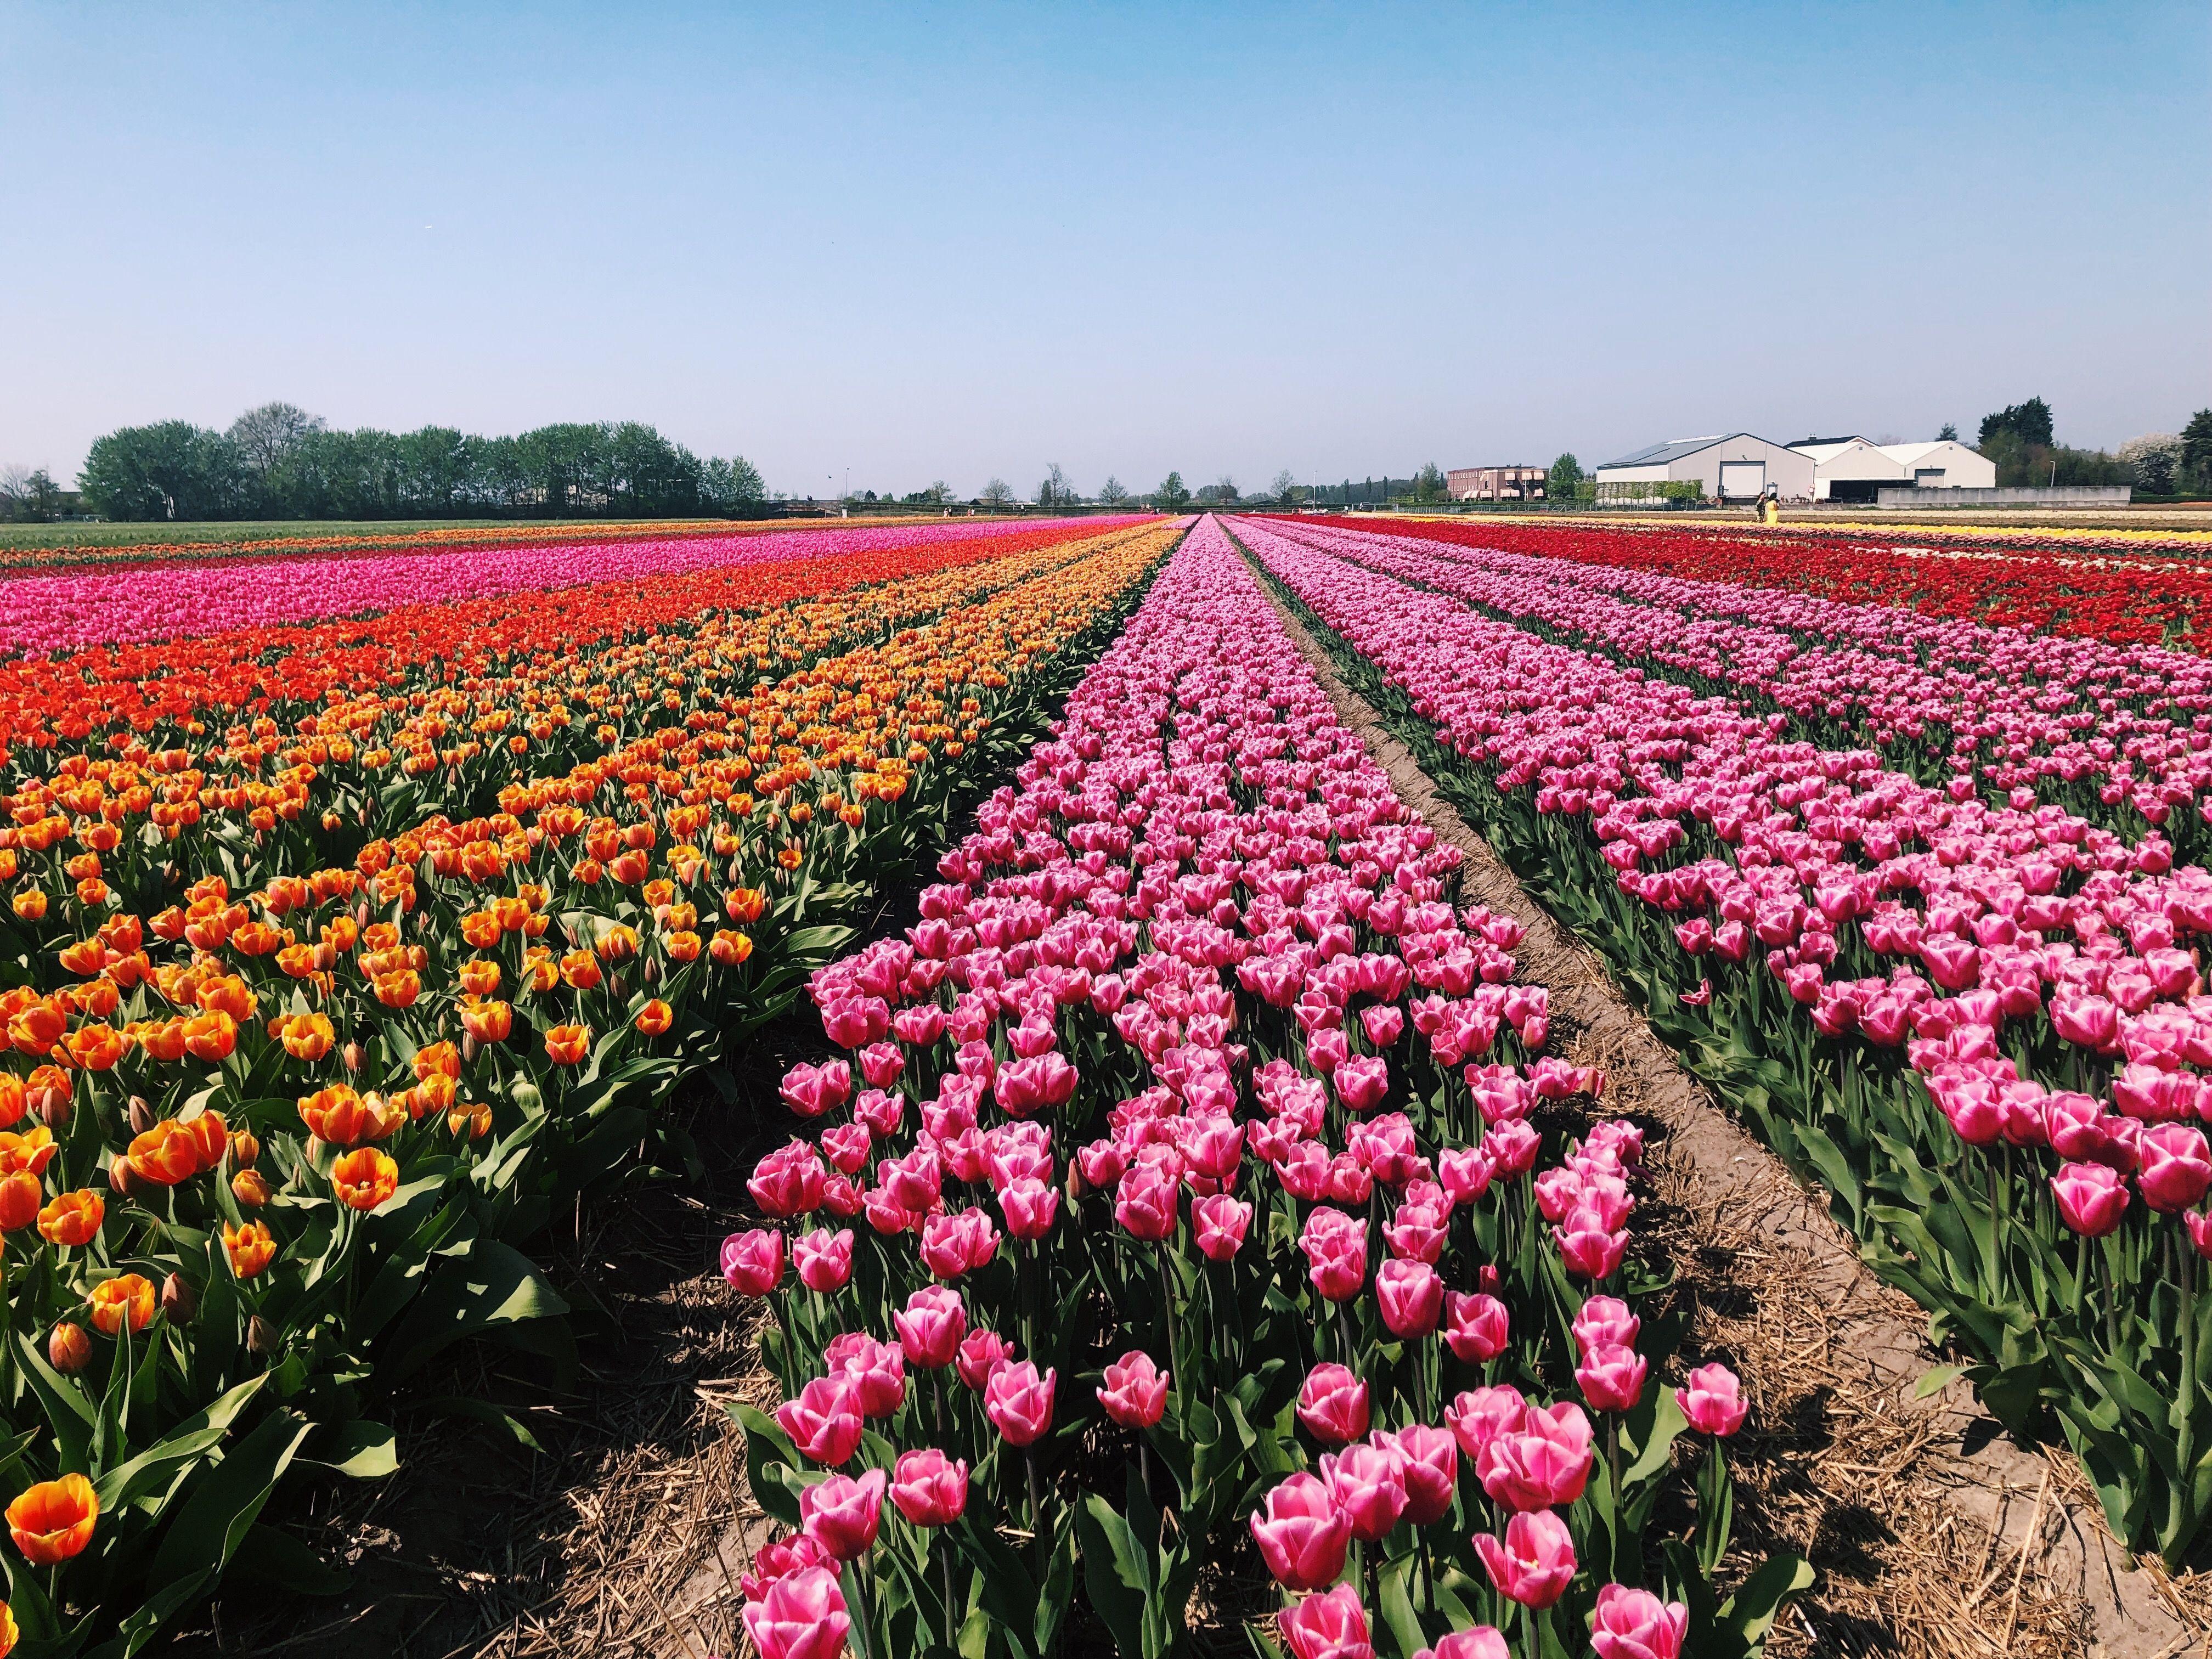 Tulip Fields Lisse Netherlands Private Tour At Fam Flower Farm Travel Wanderlust Tulipfields Flowerfields Holland Tulip Fields Flower Farm Fields